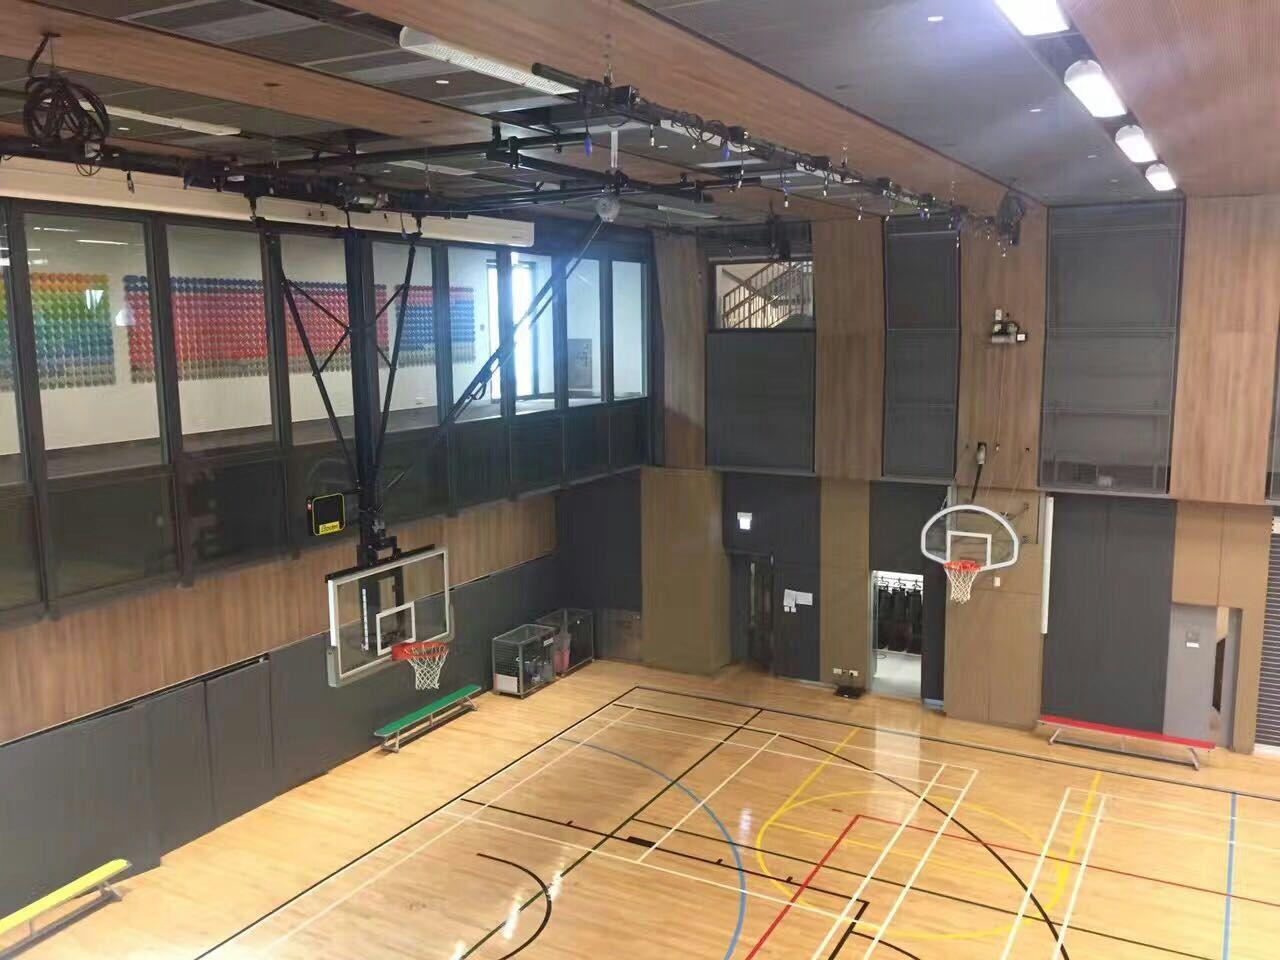 Gymnasium Ceiling Mounted Basketball Hoops